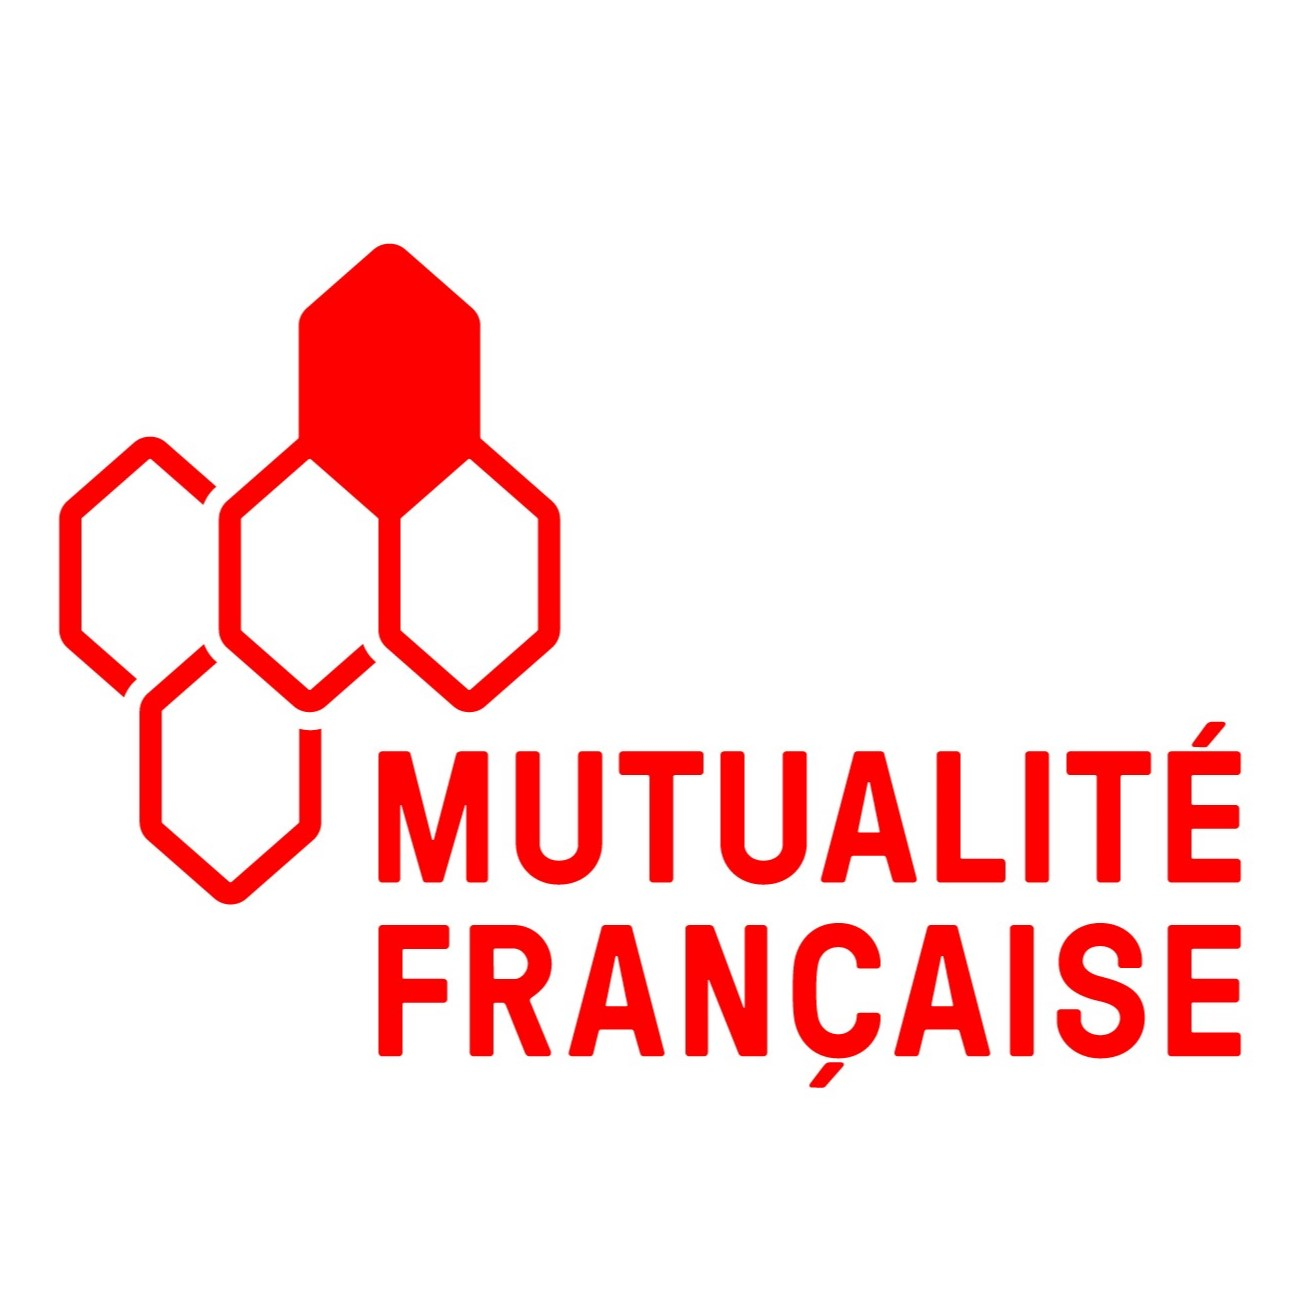 Mutualite-française-carre